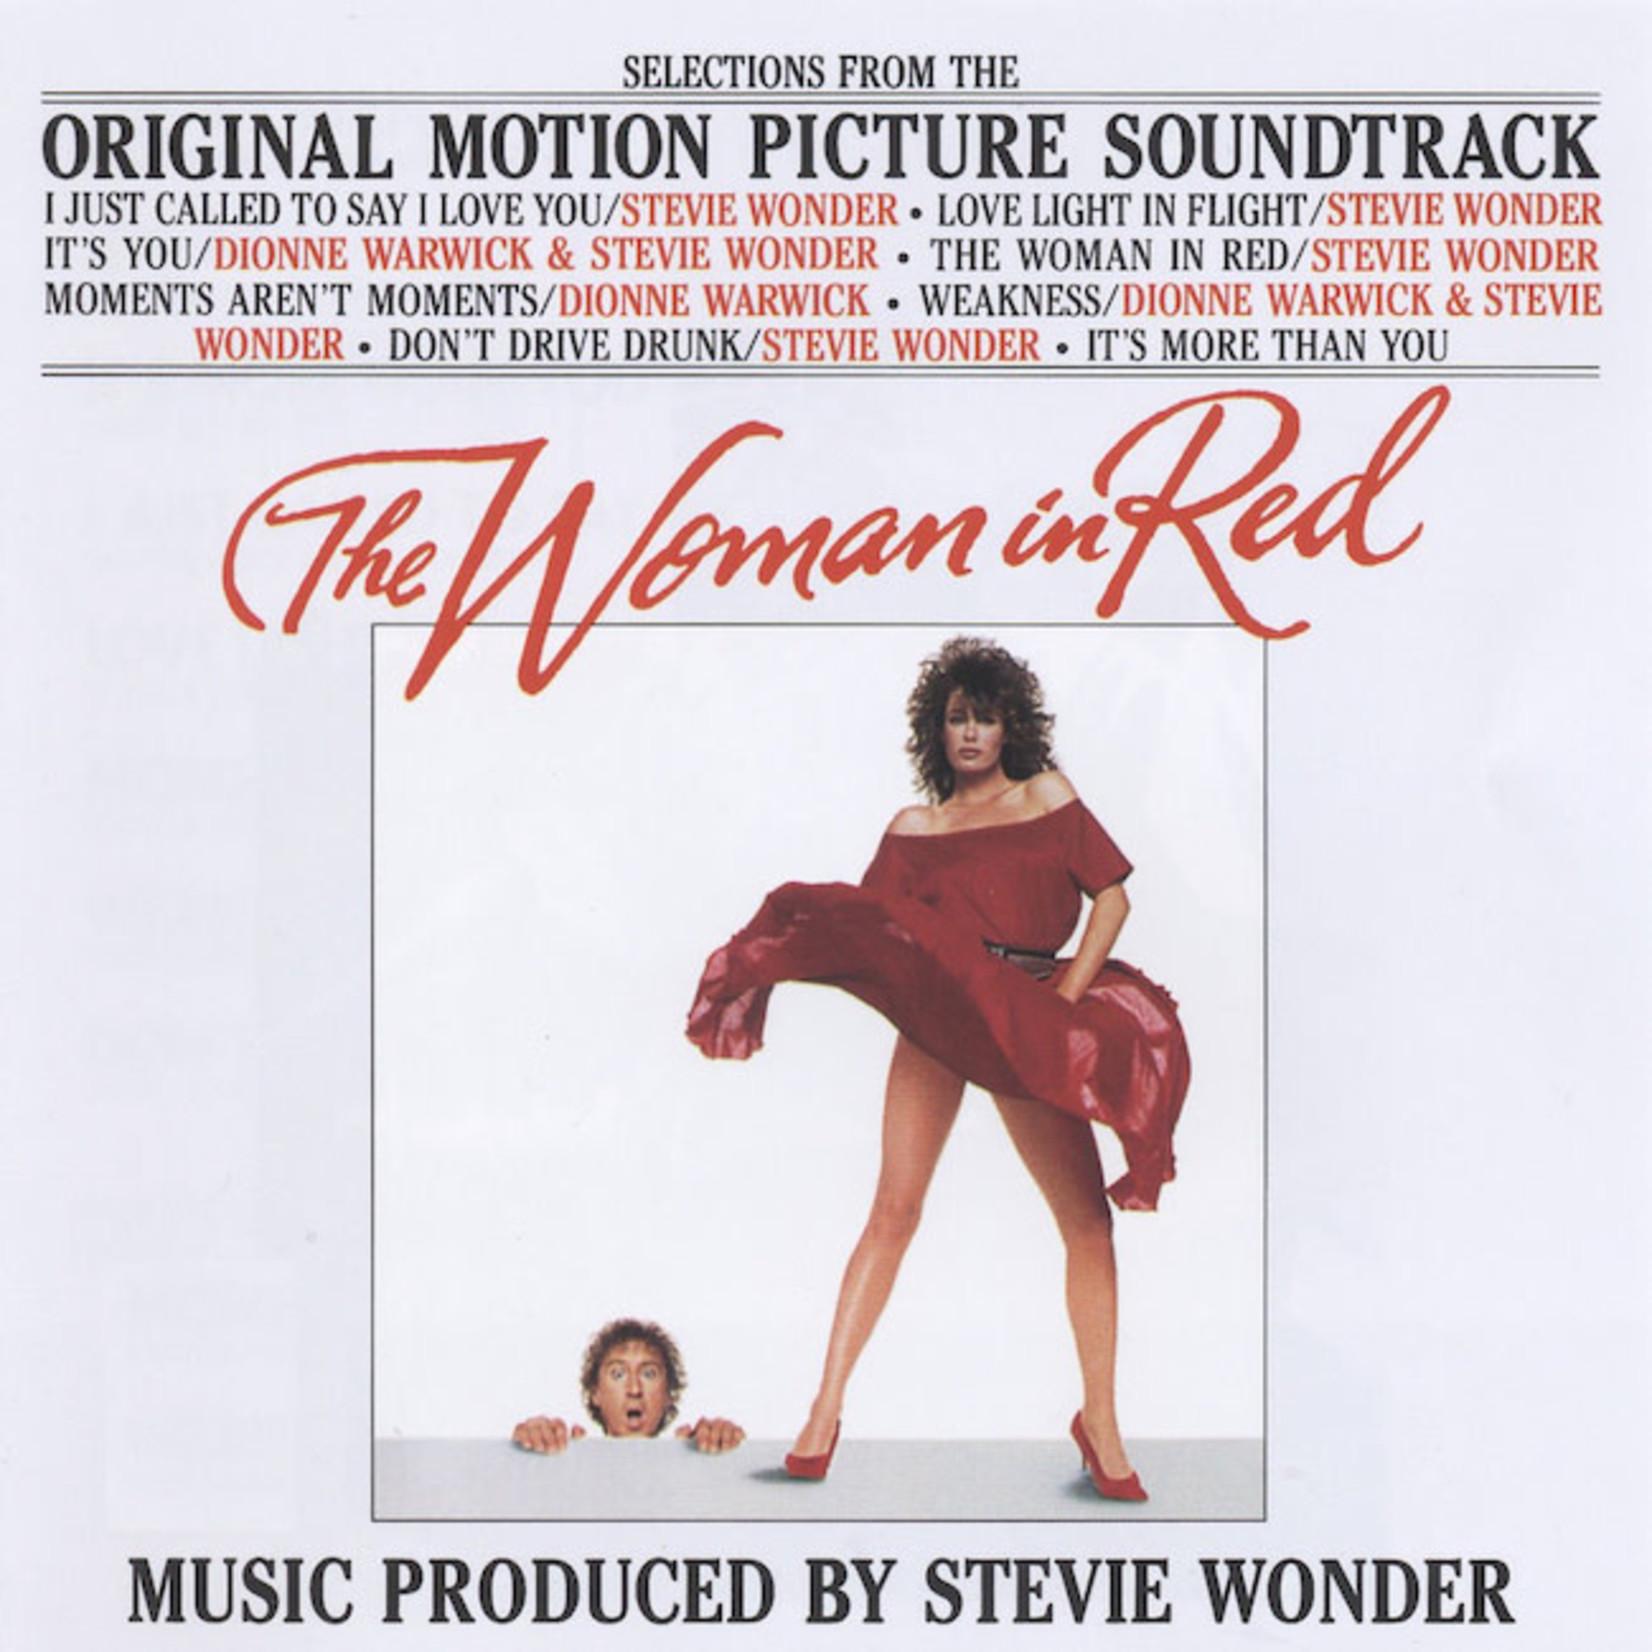 [Vintage] Wonder, Stevie: Woman in Red (Soundtrack)